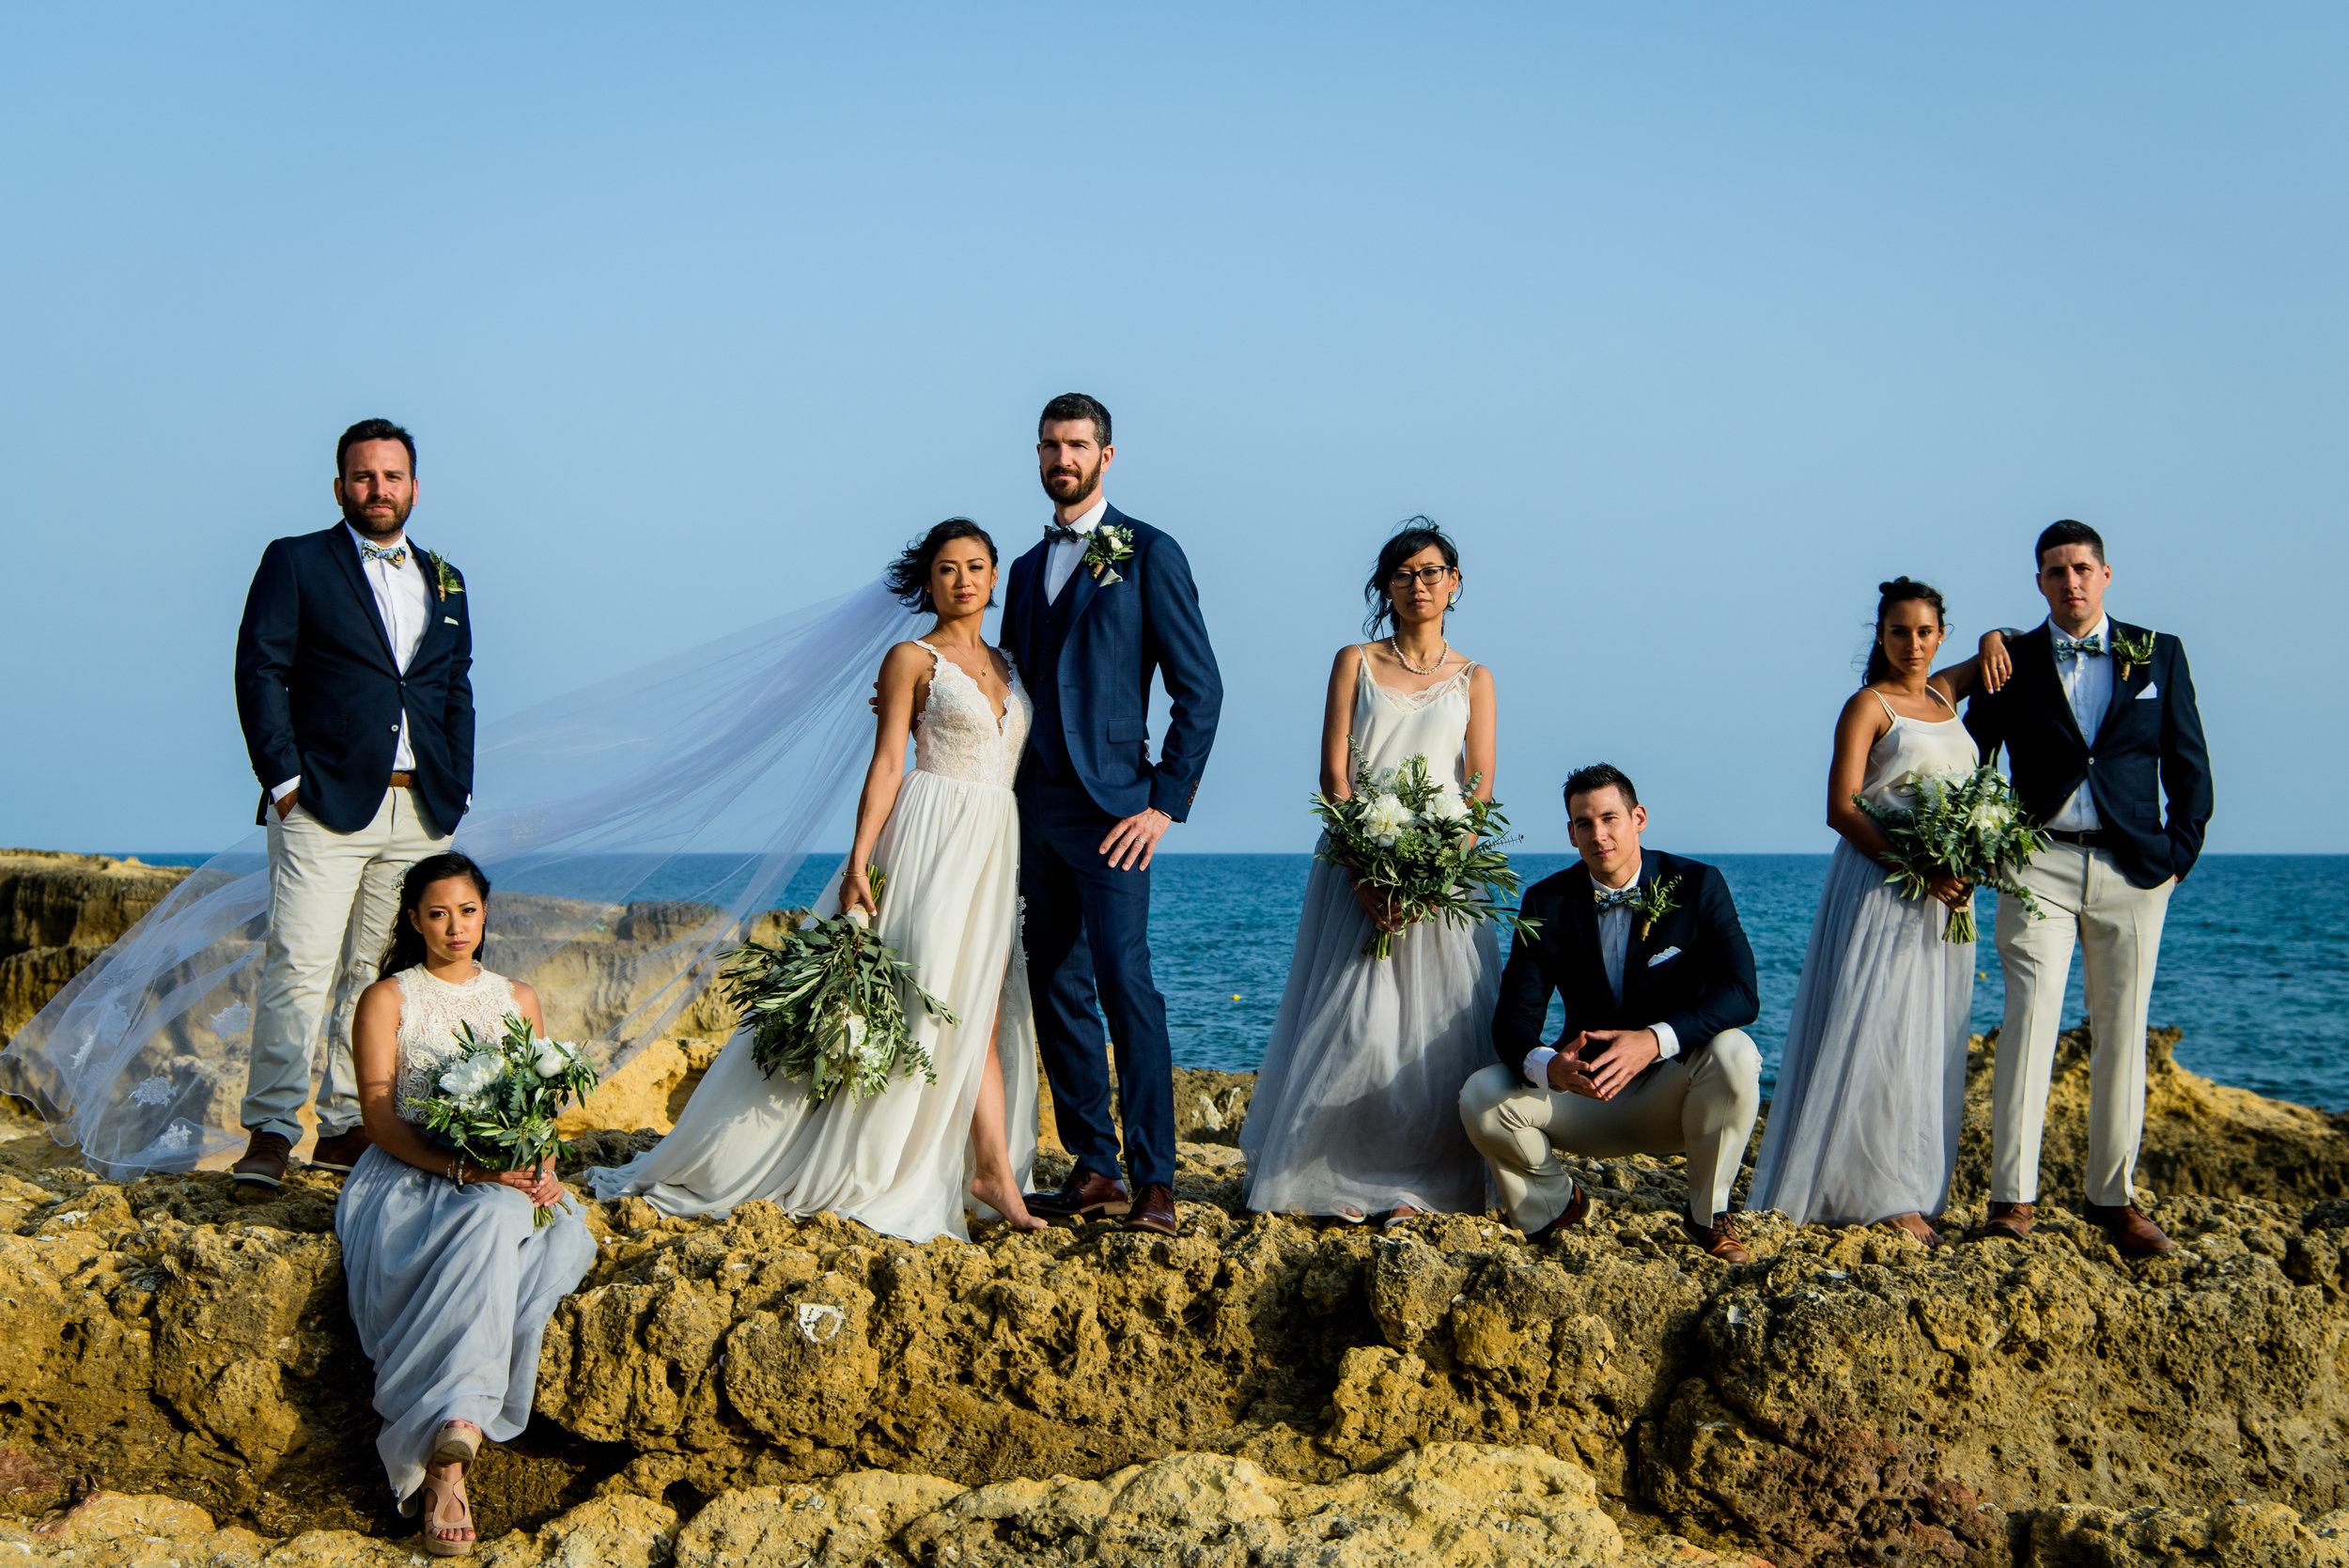 minty-frank-wedding-favorites-150.jpg